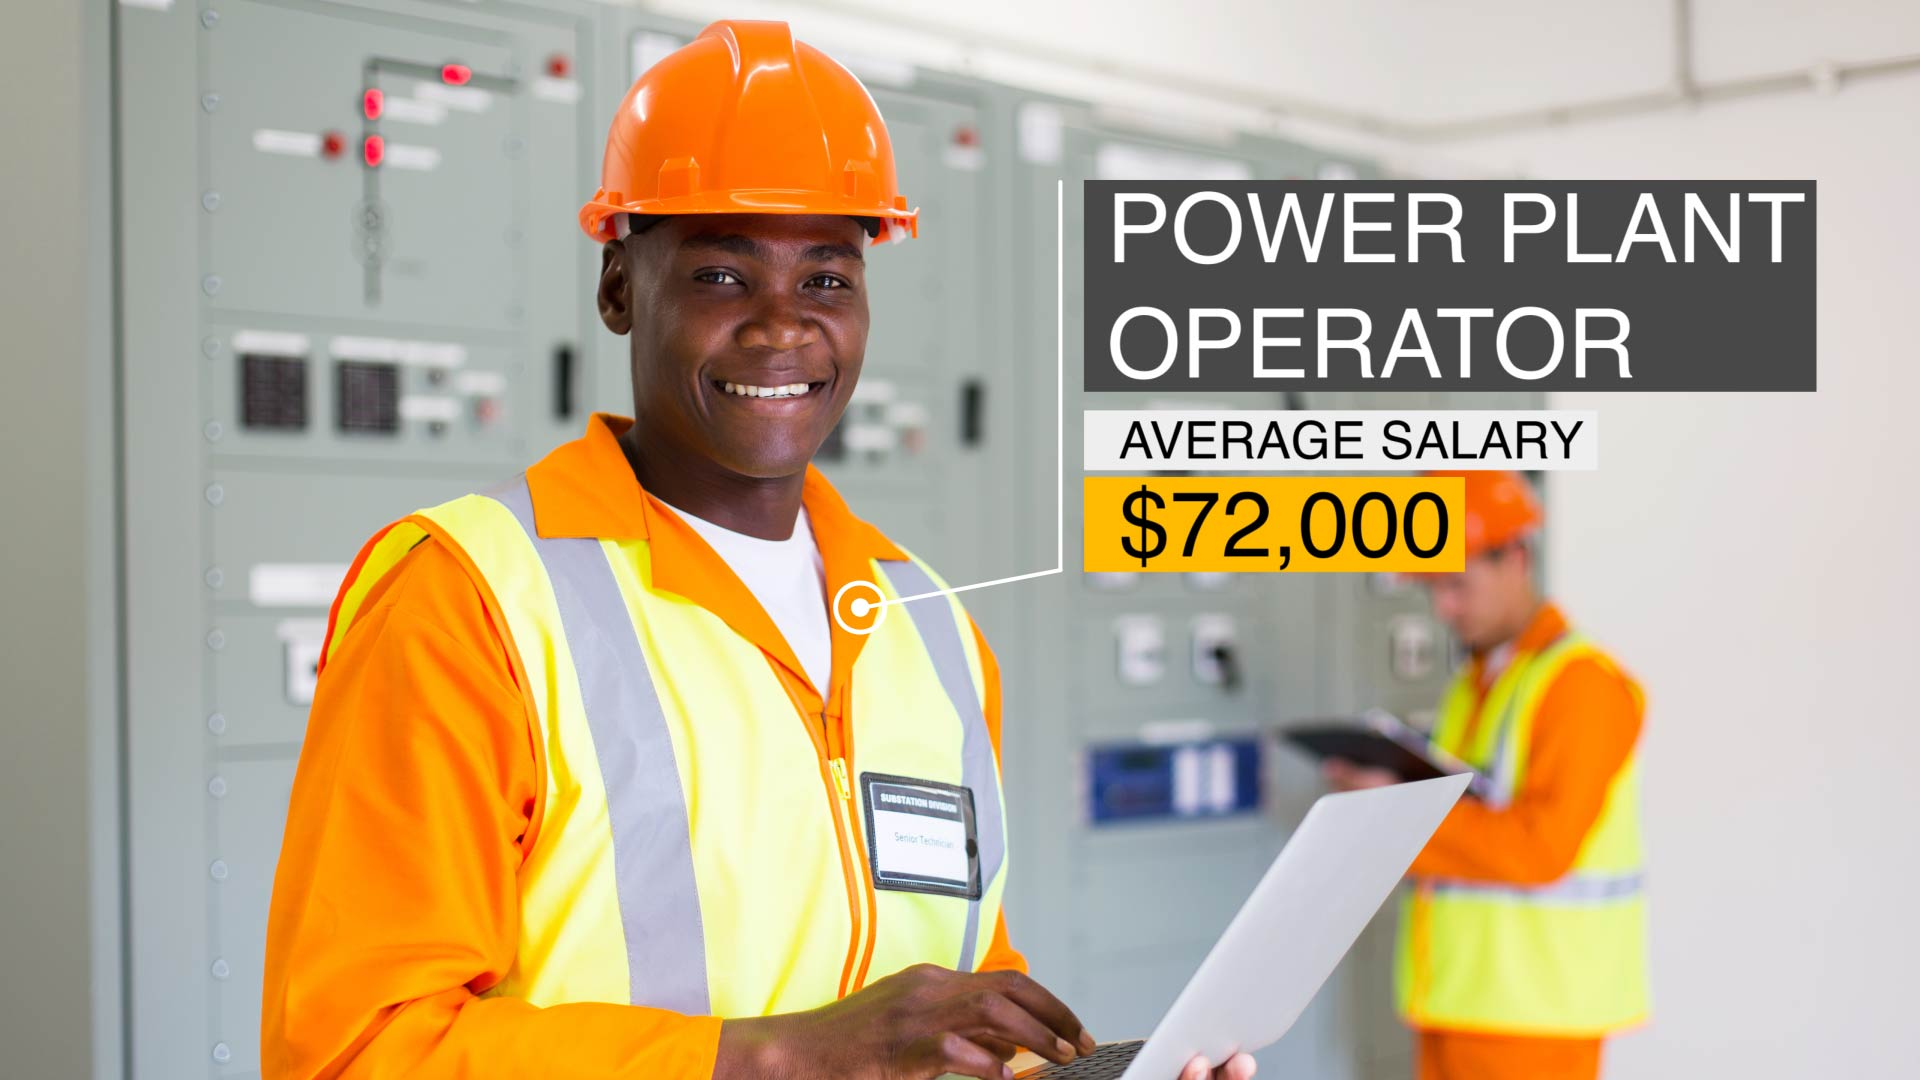 Power Plant Operator